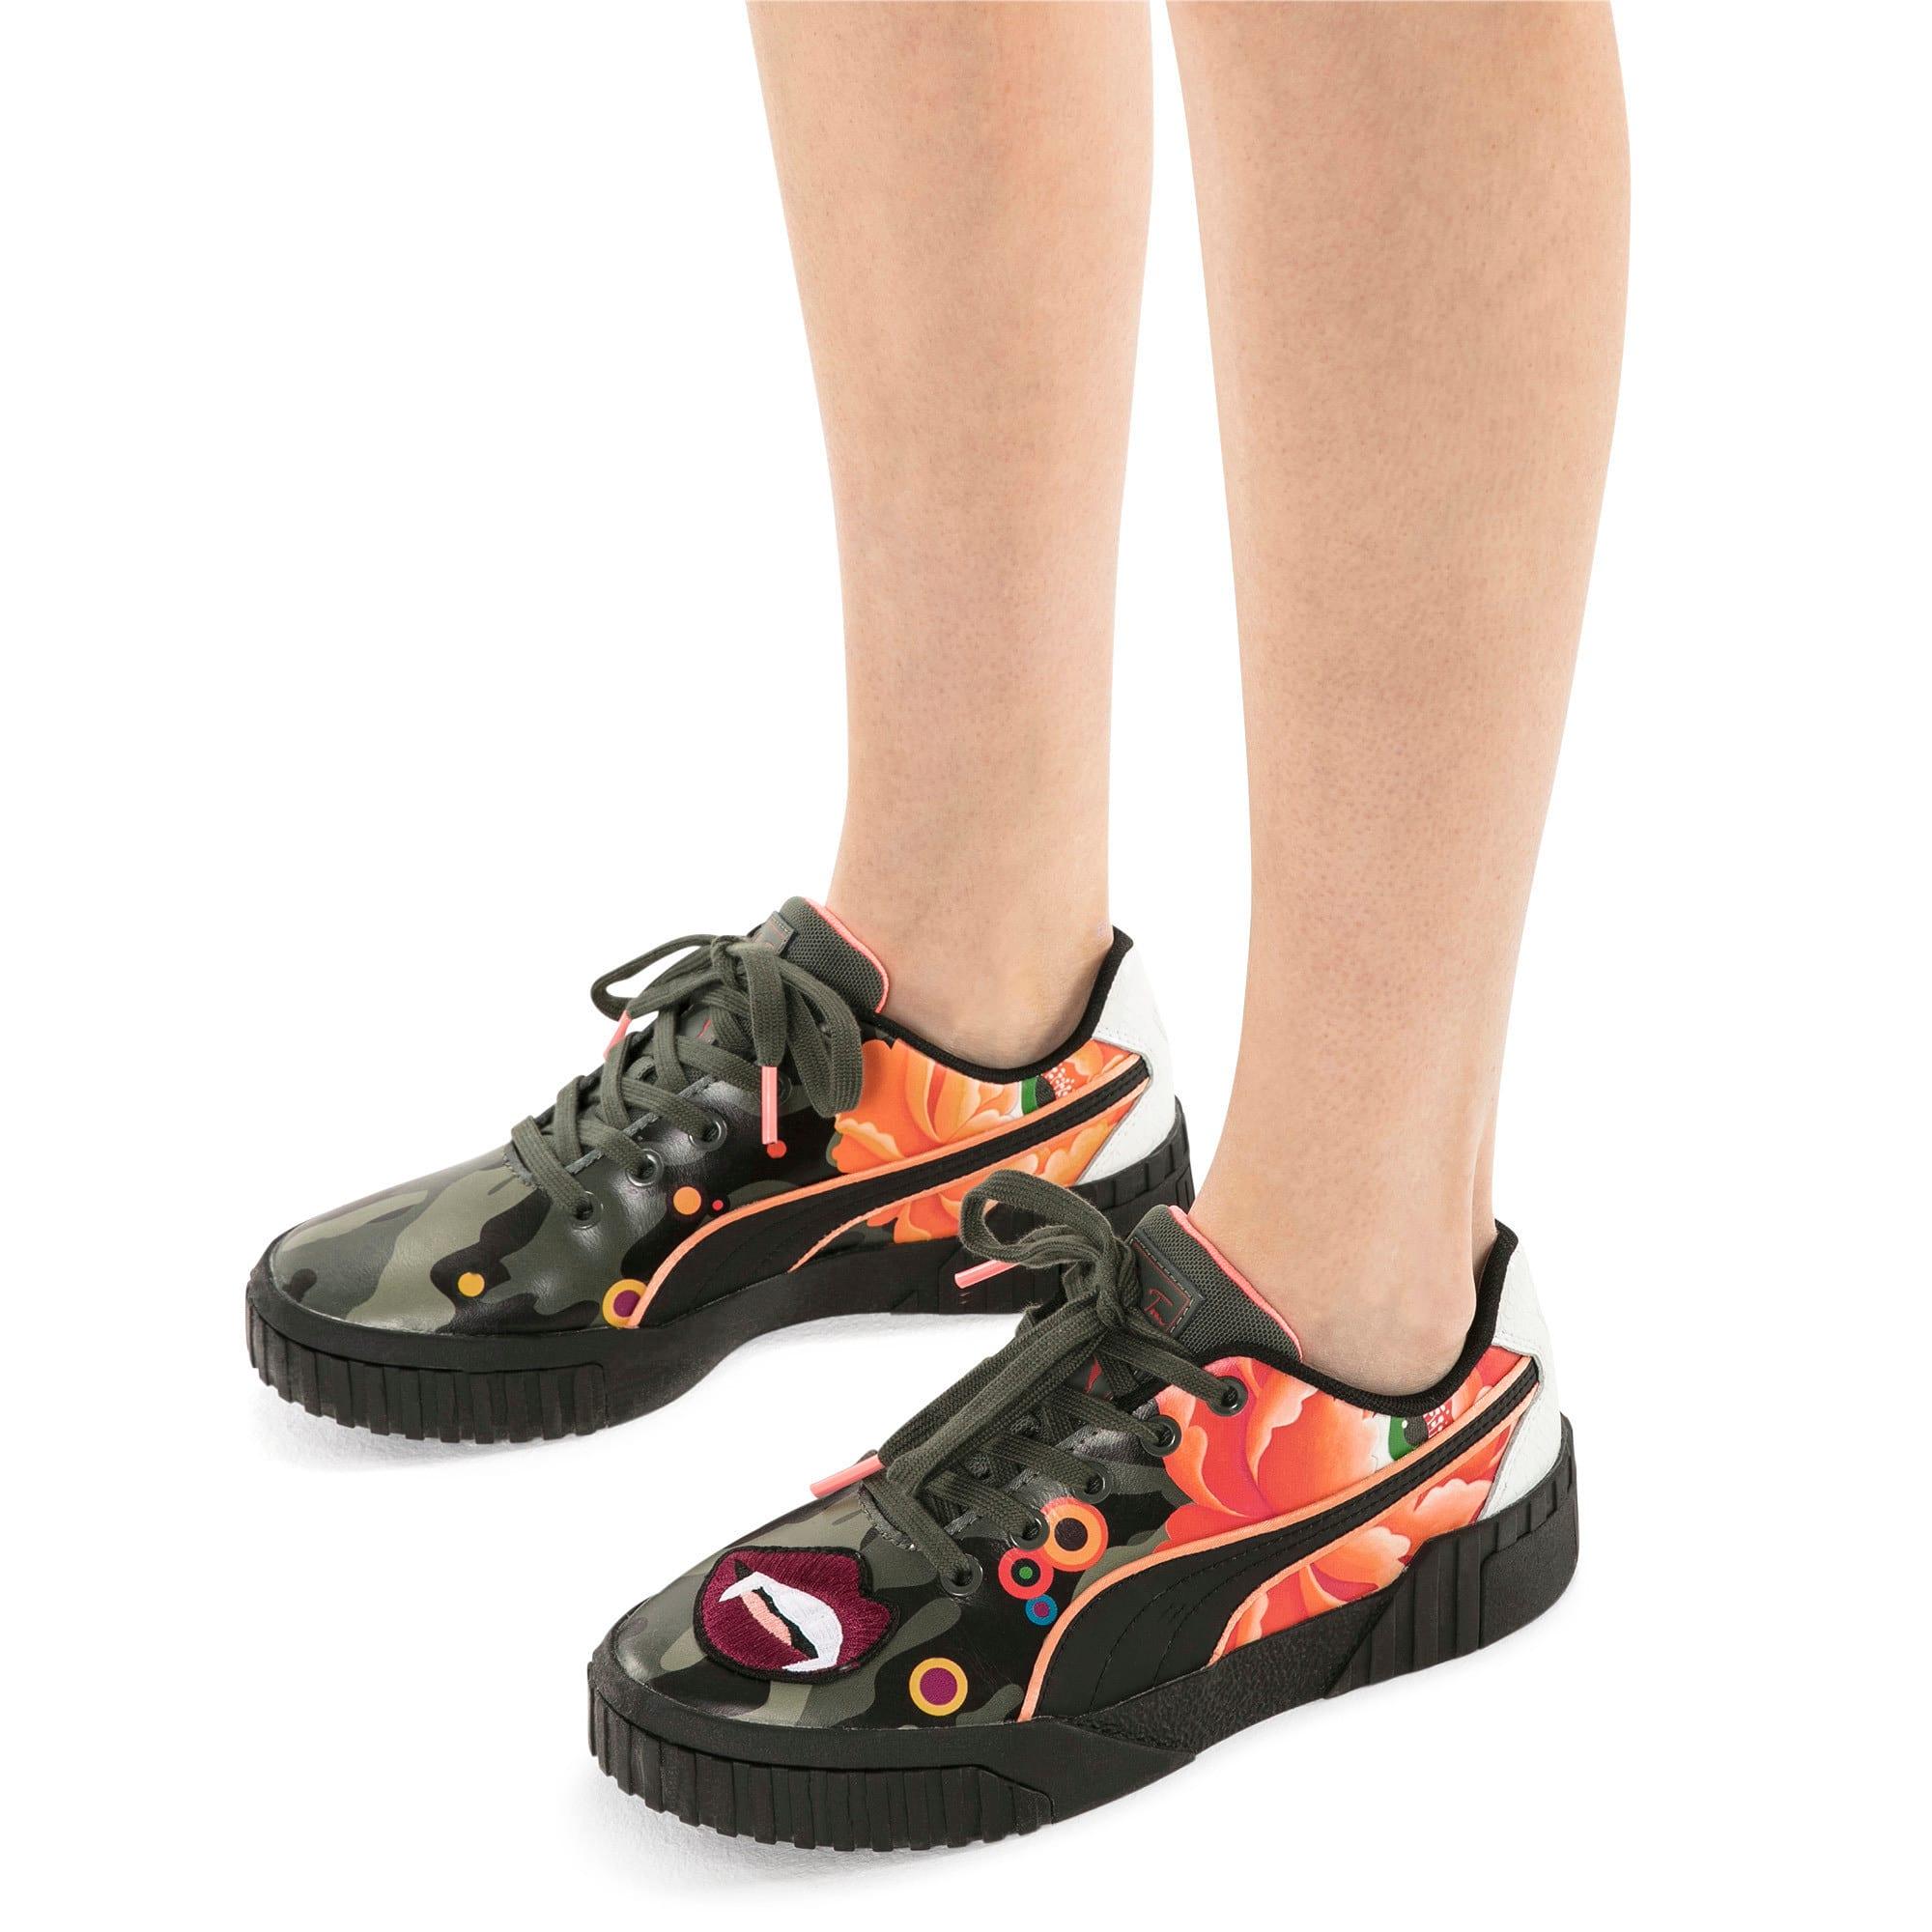 Thumbnail 2 of PUMA x SUE TSAI Cali Peonies Camo Women's Sneakers, Puma Black-Puma Black, medium